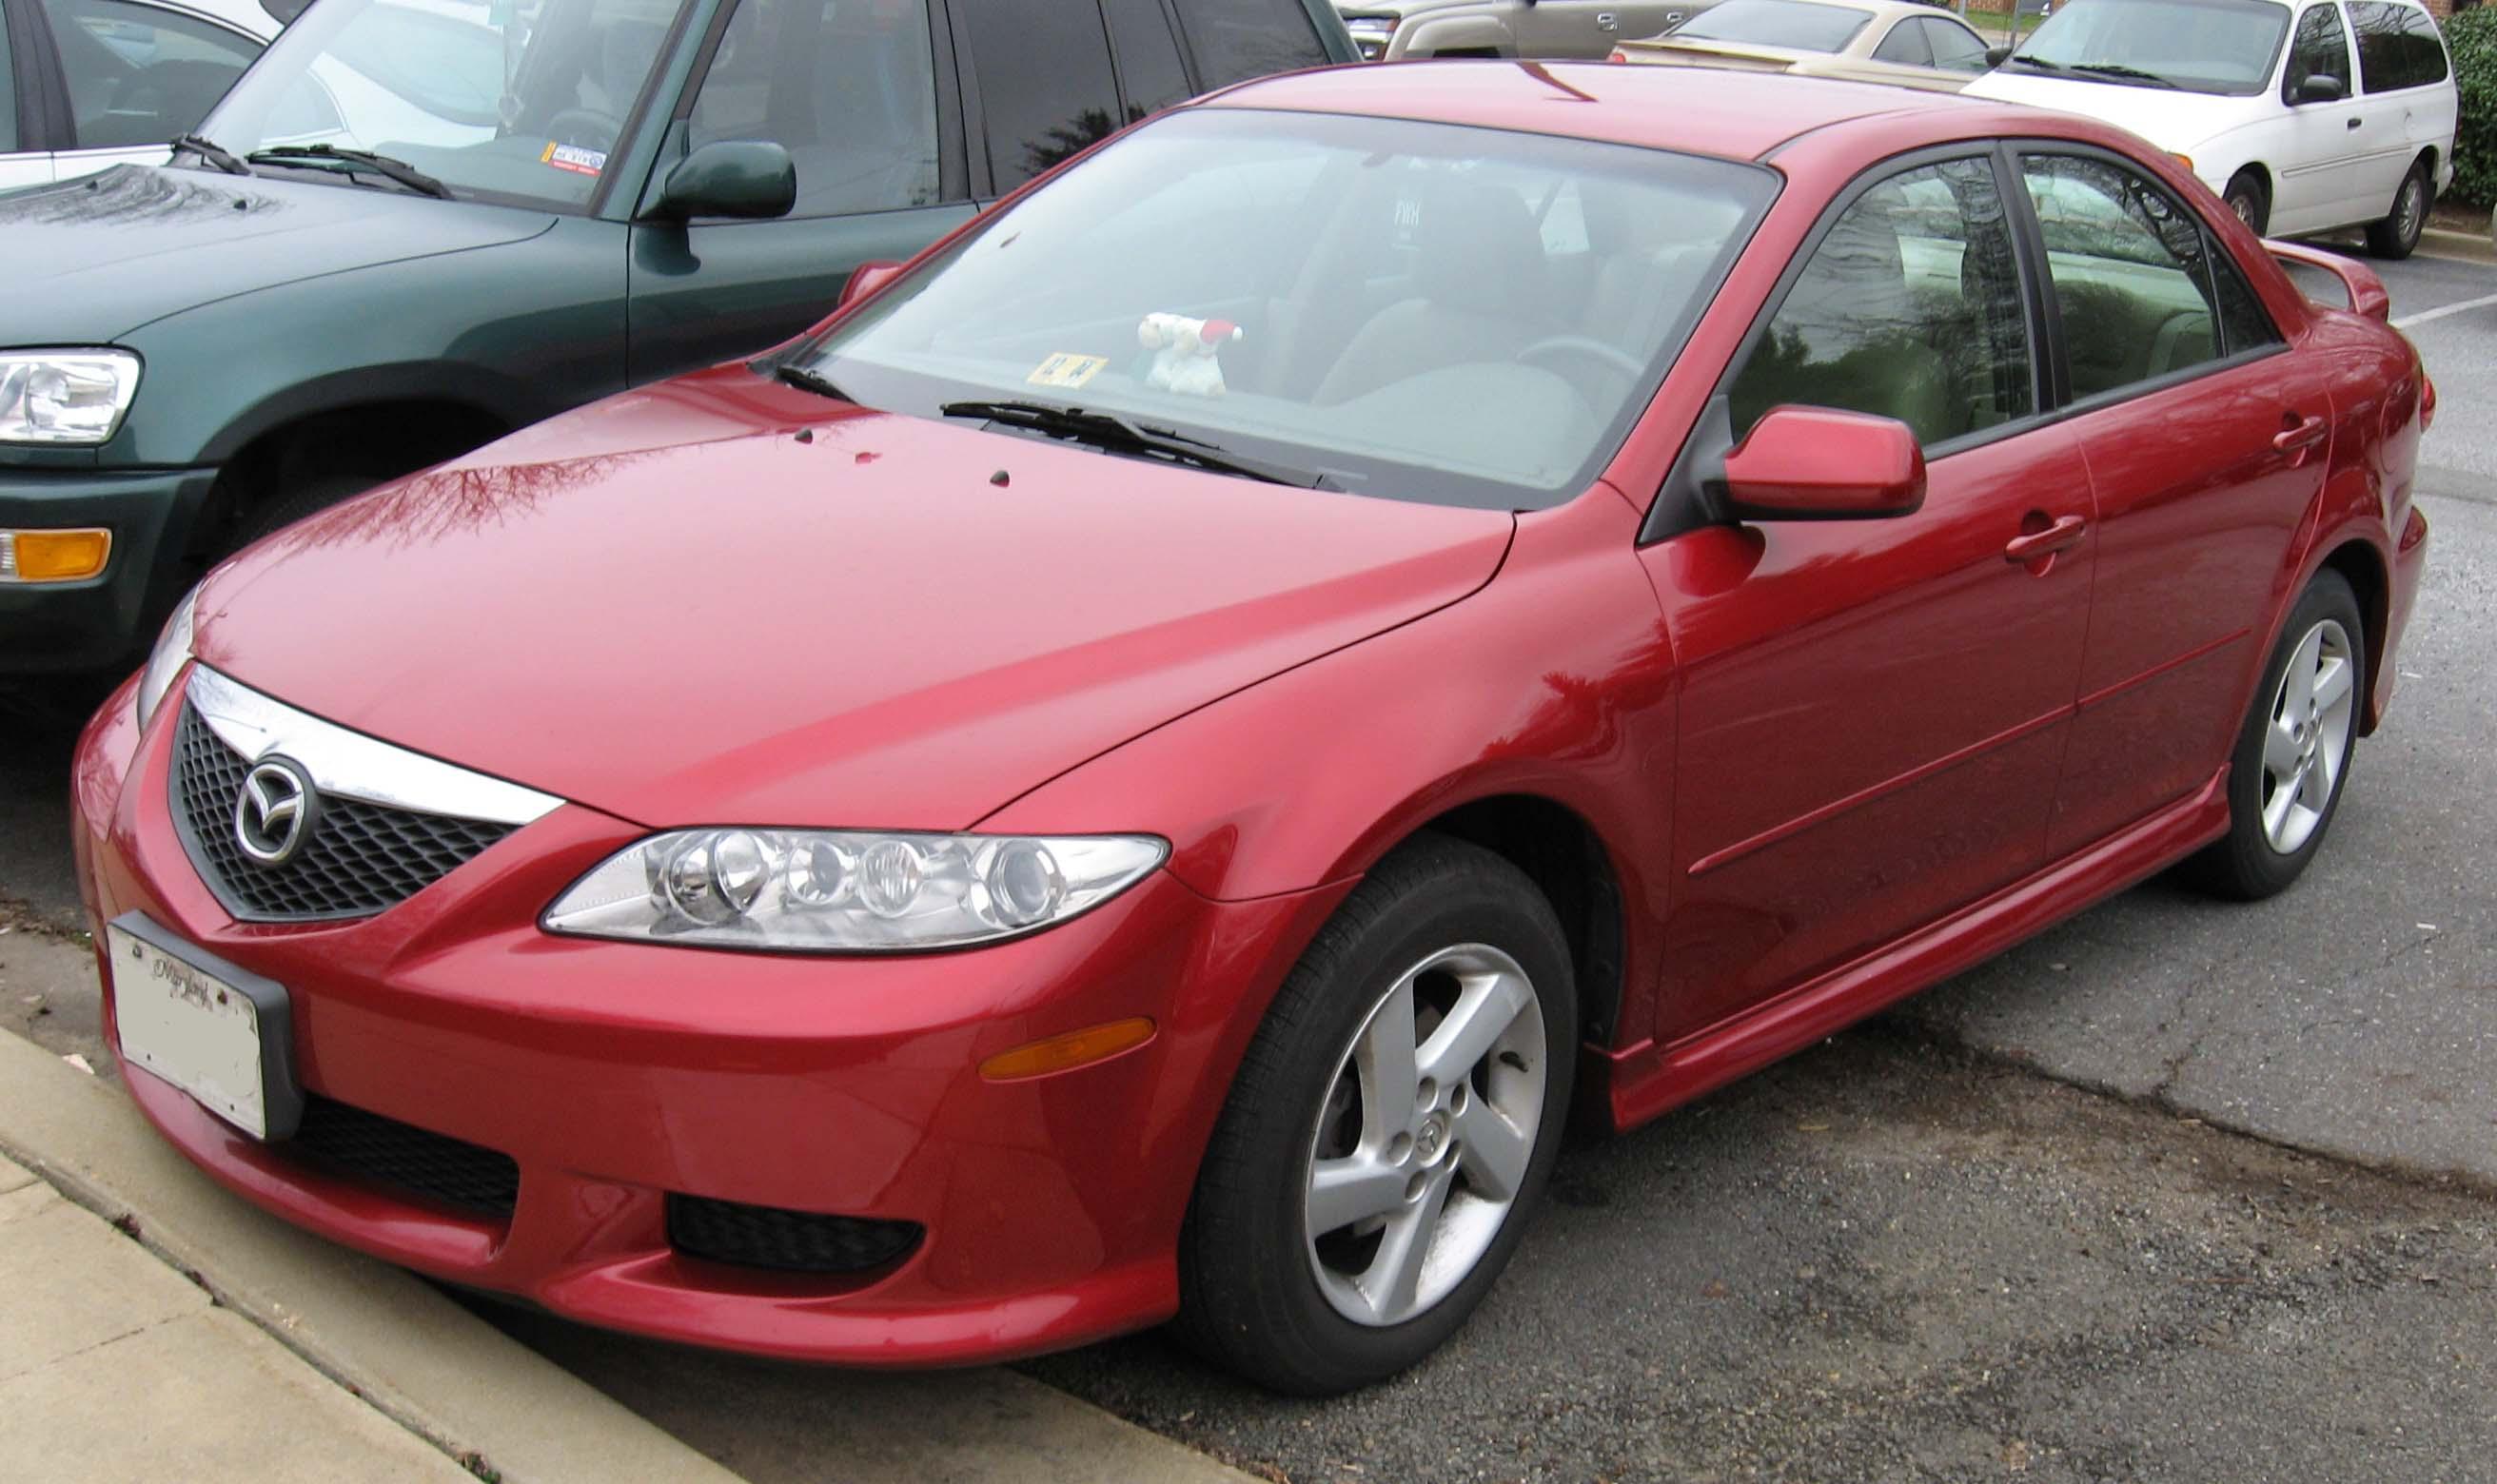 https://upload.wikimedia.org/wikipedia/commons/9/96/Mazda6_sedan.jpg